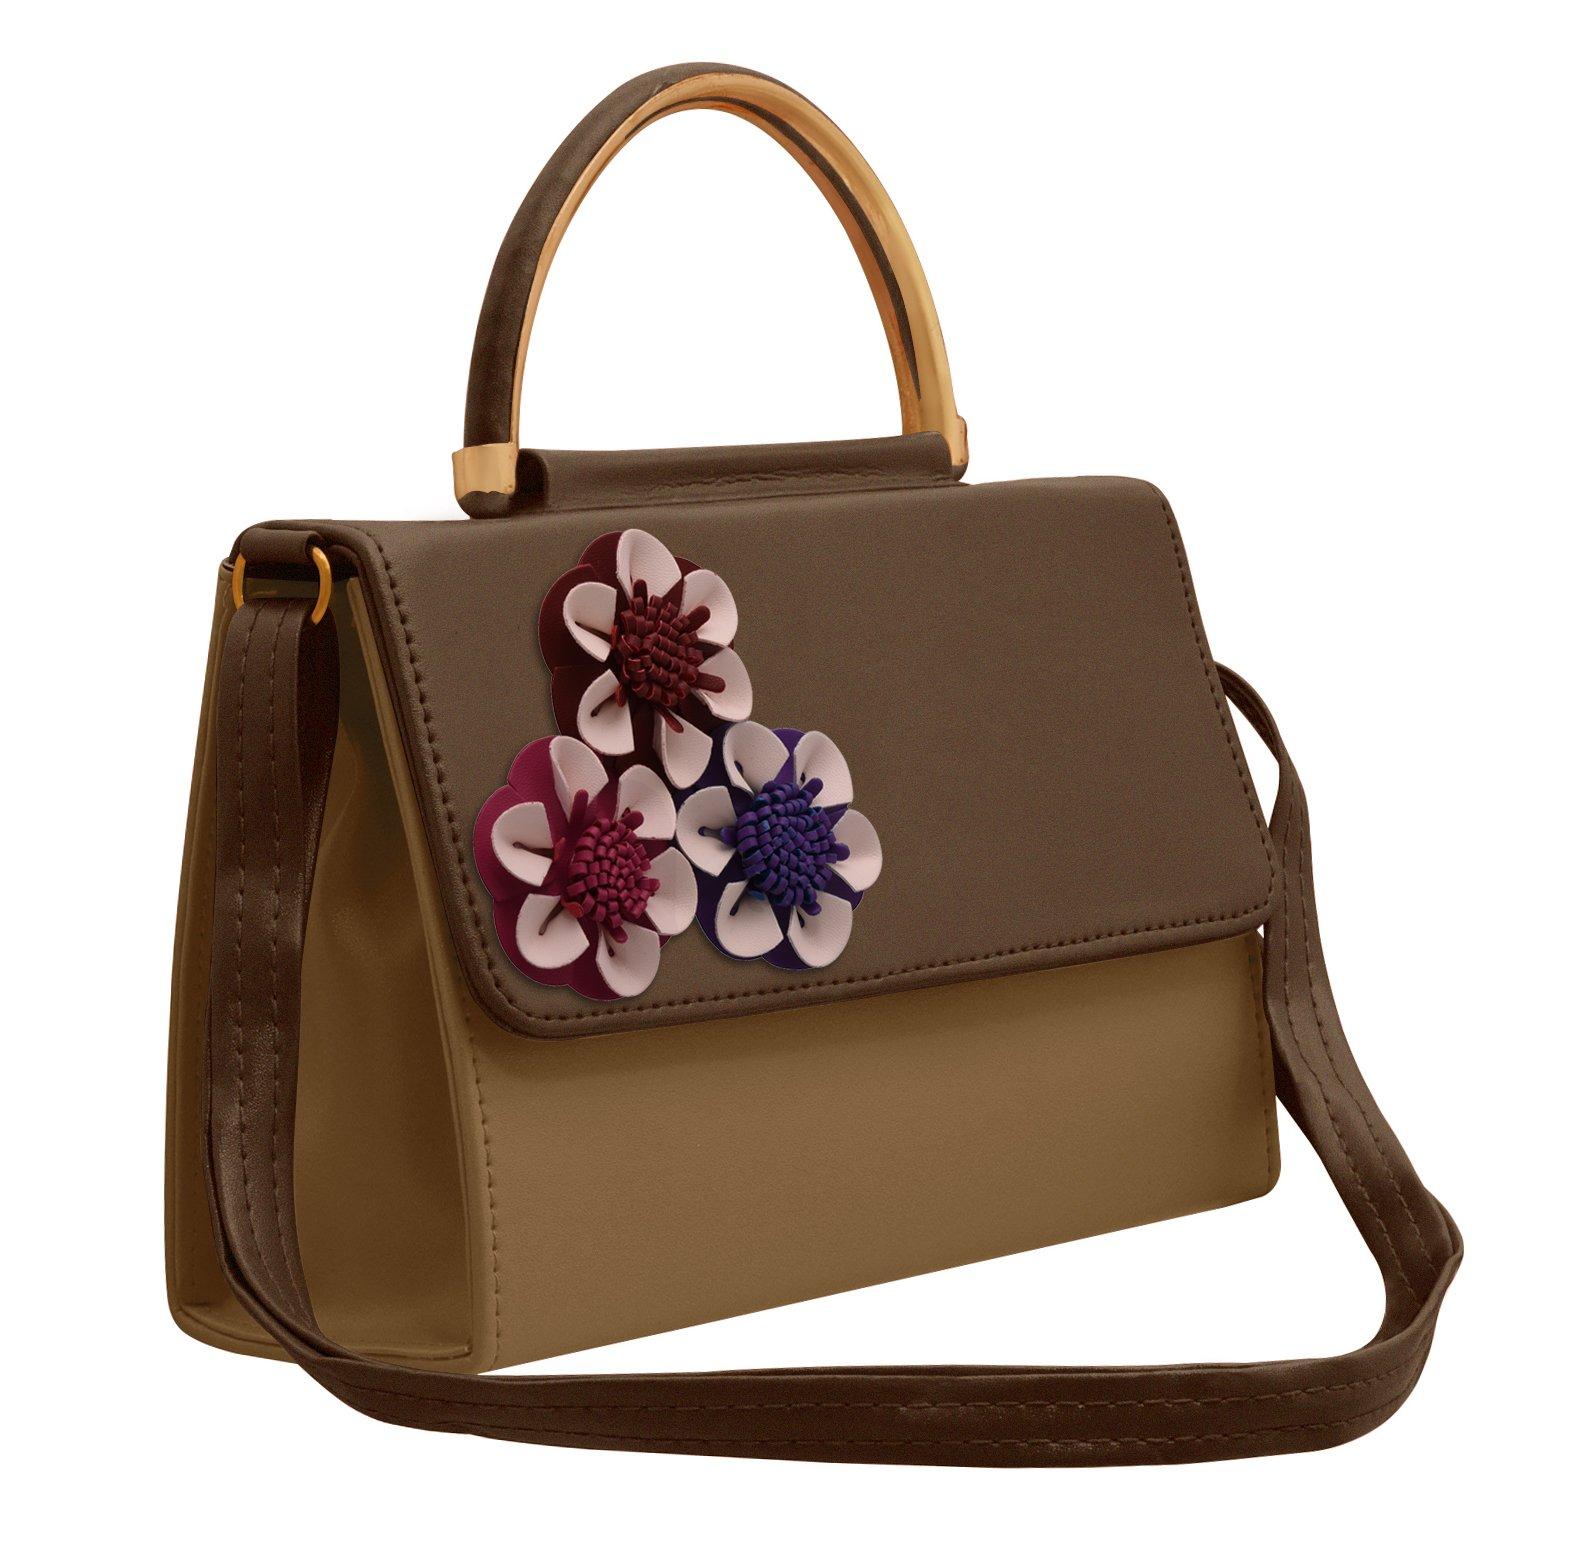 TAP FASHION Fancy Stylish PU Leather Women s Handbag 8566ecdeed217